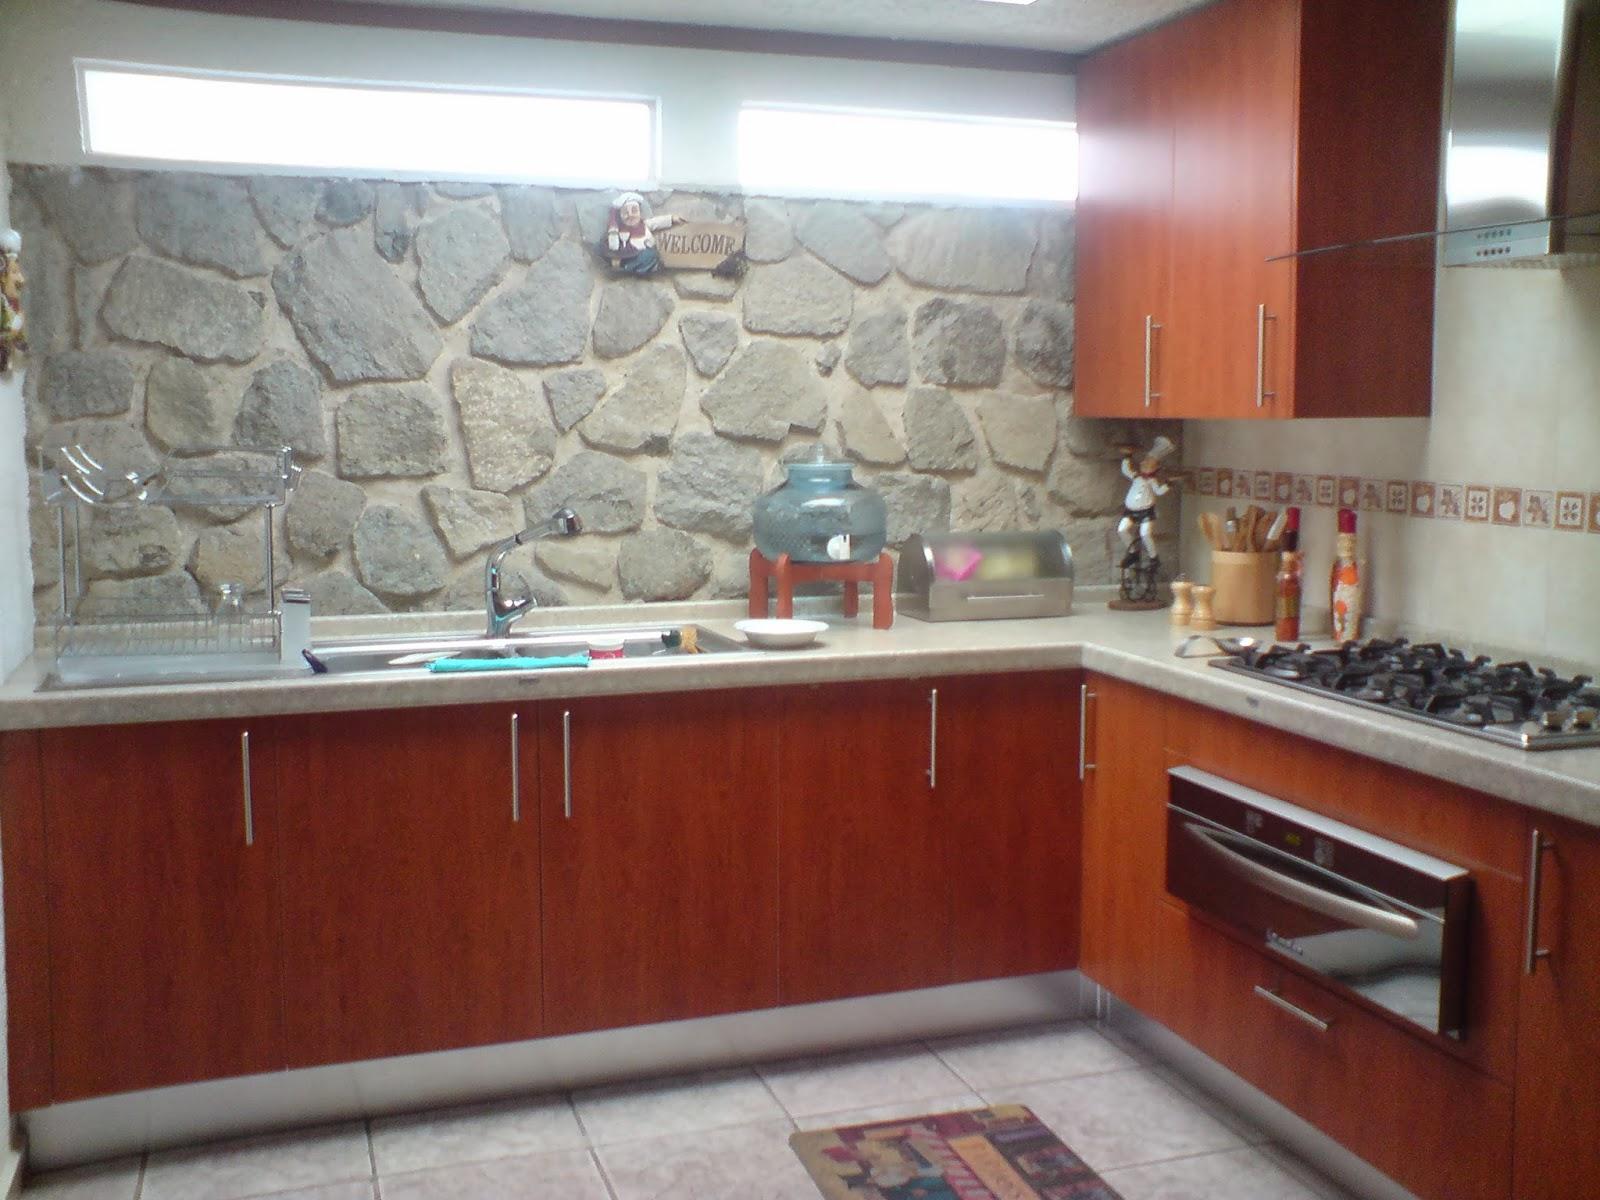 Dise o en cocinas integrales galeria cocinas material for Material granito para cocina